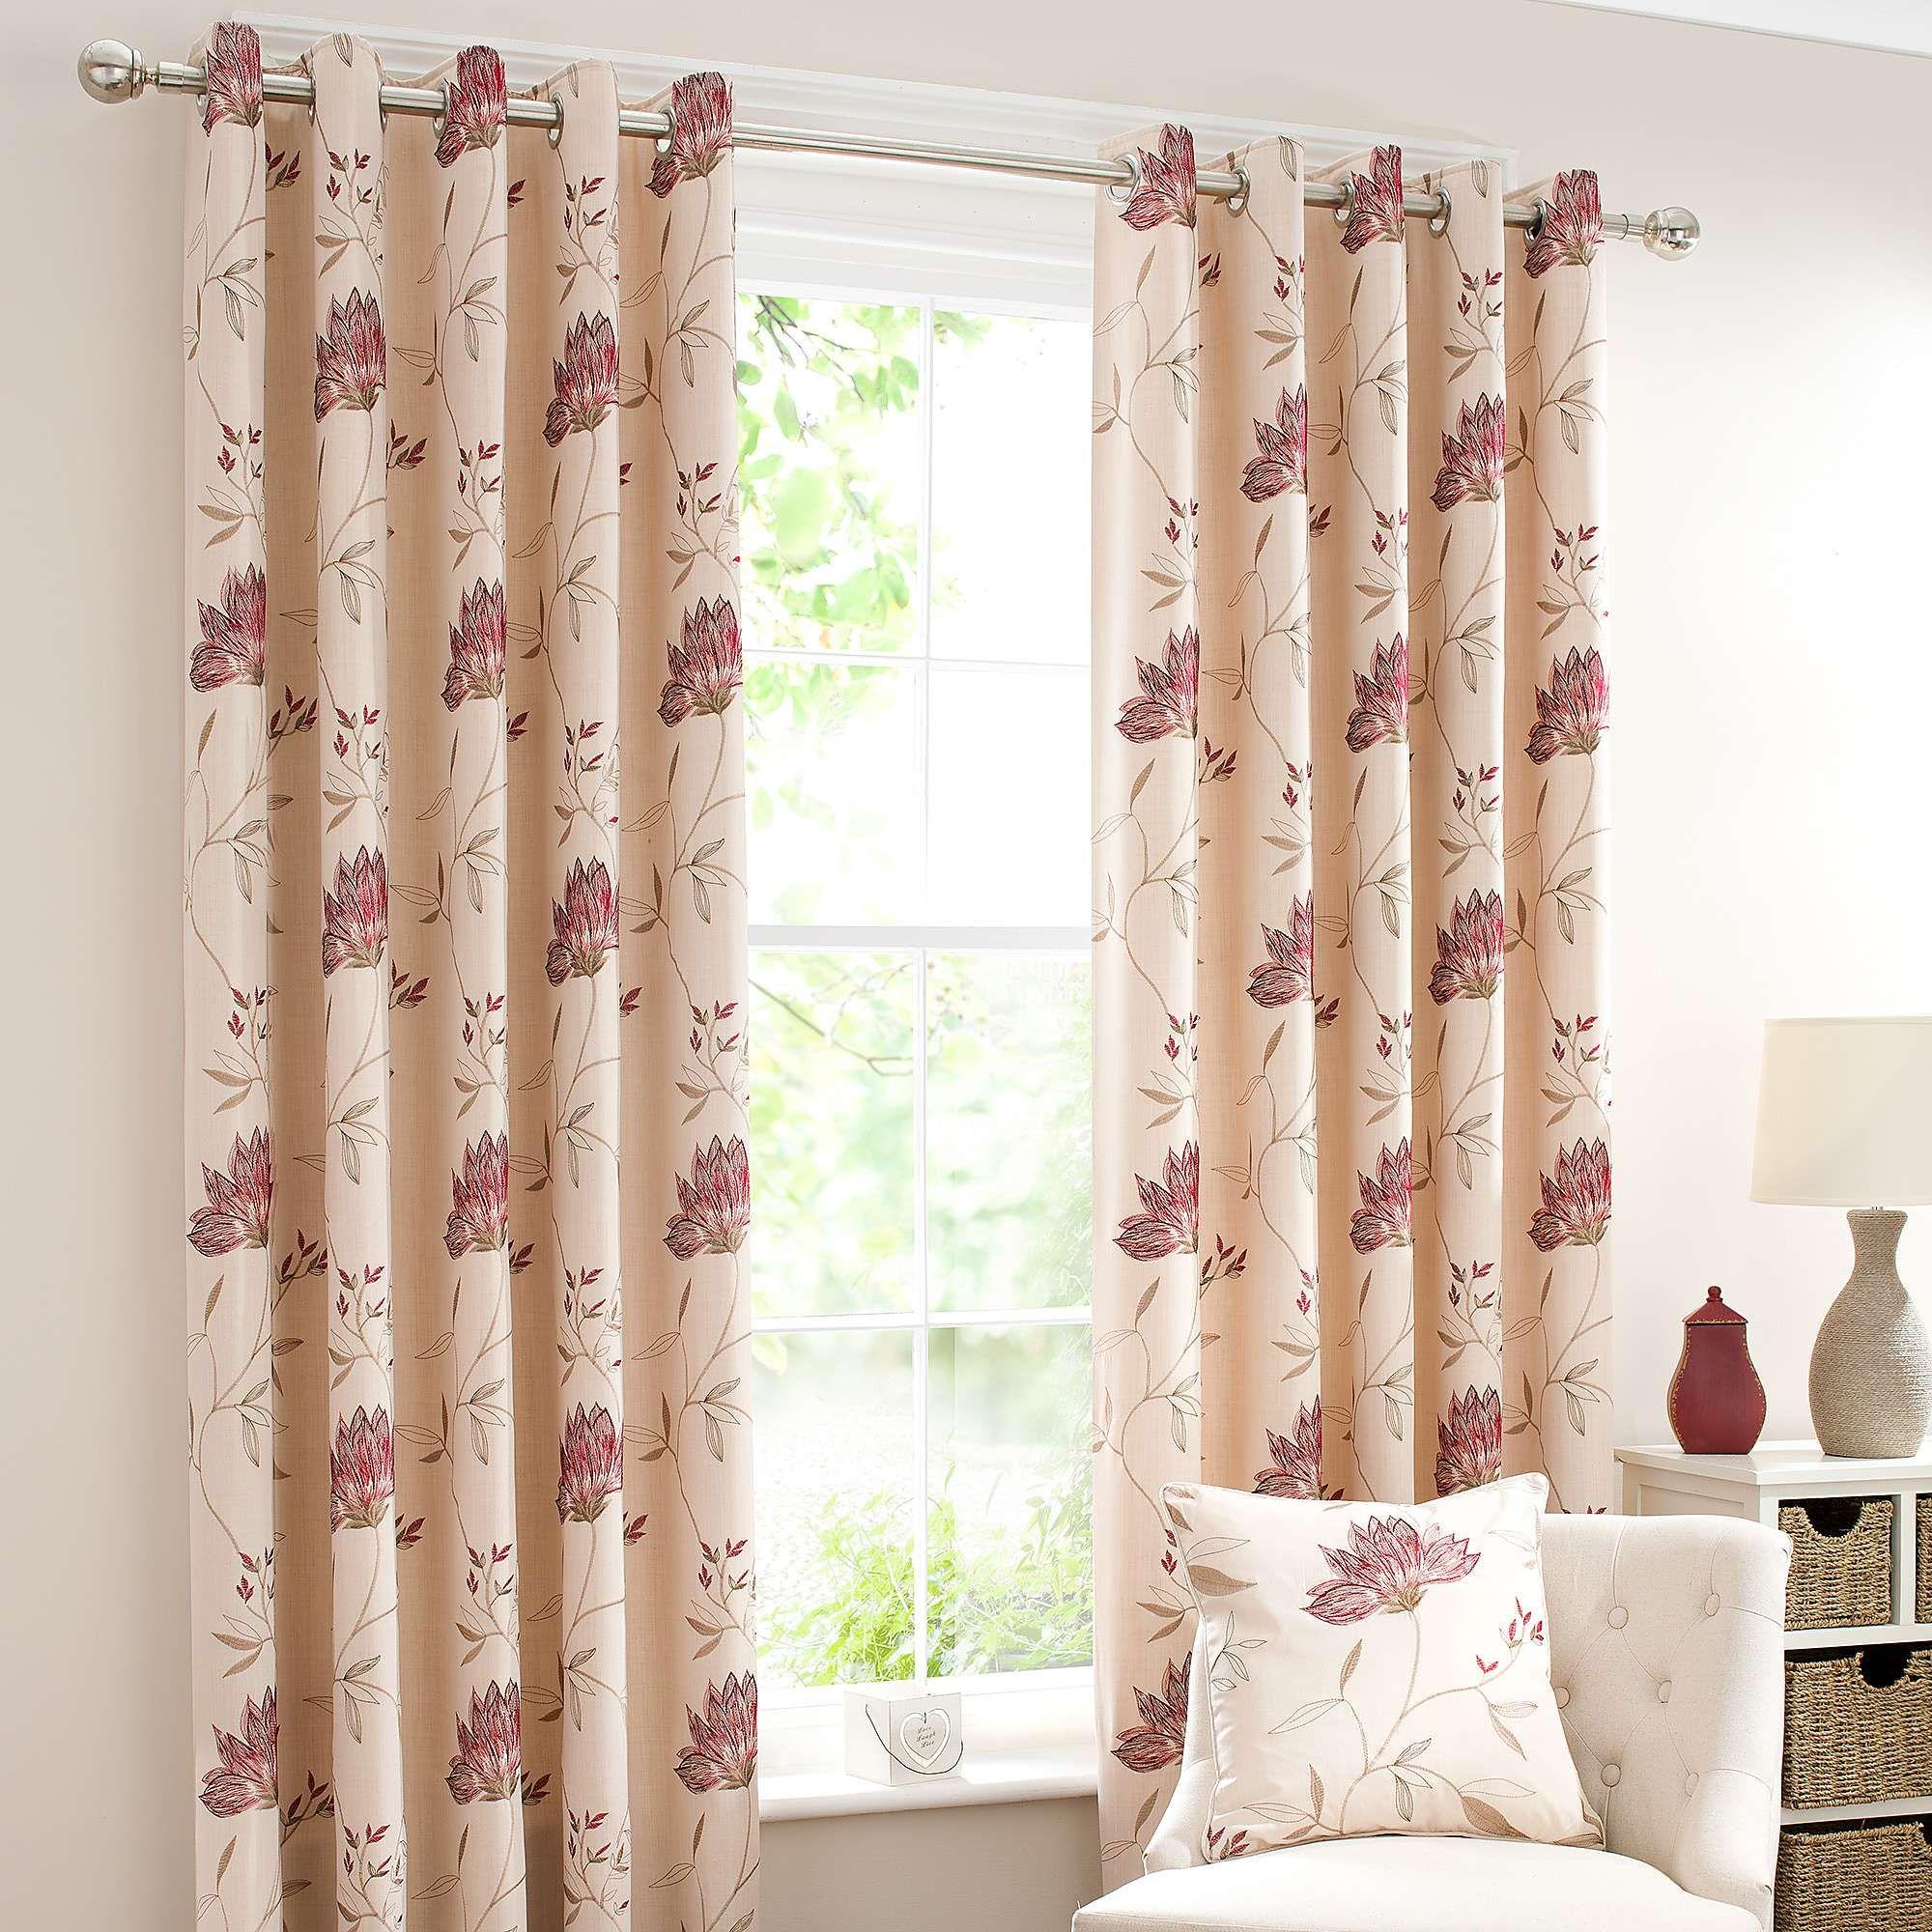 Dunelm Eyelet Curtains Red Www Myfamilyliving Com